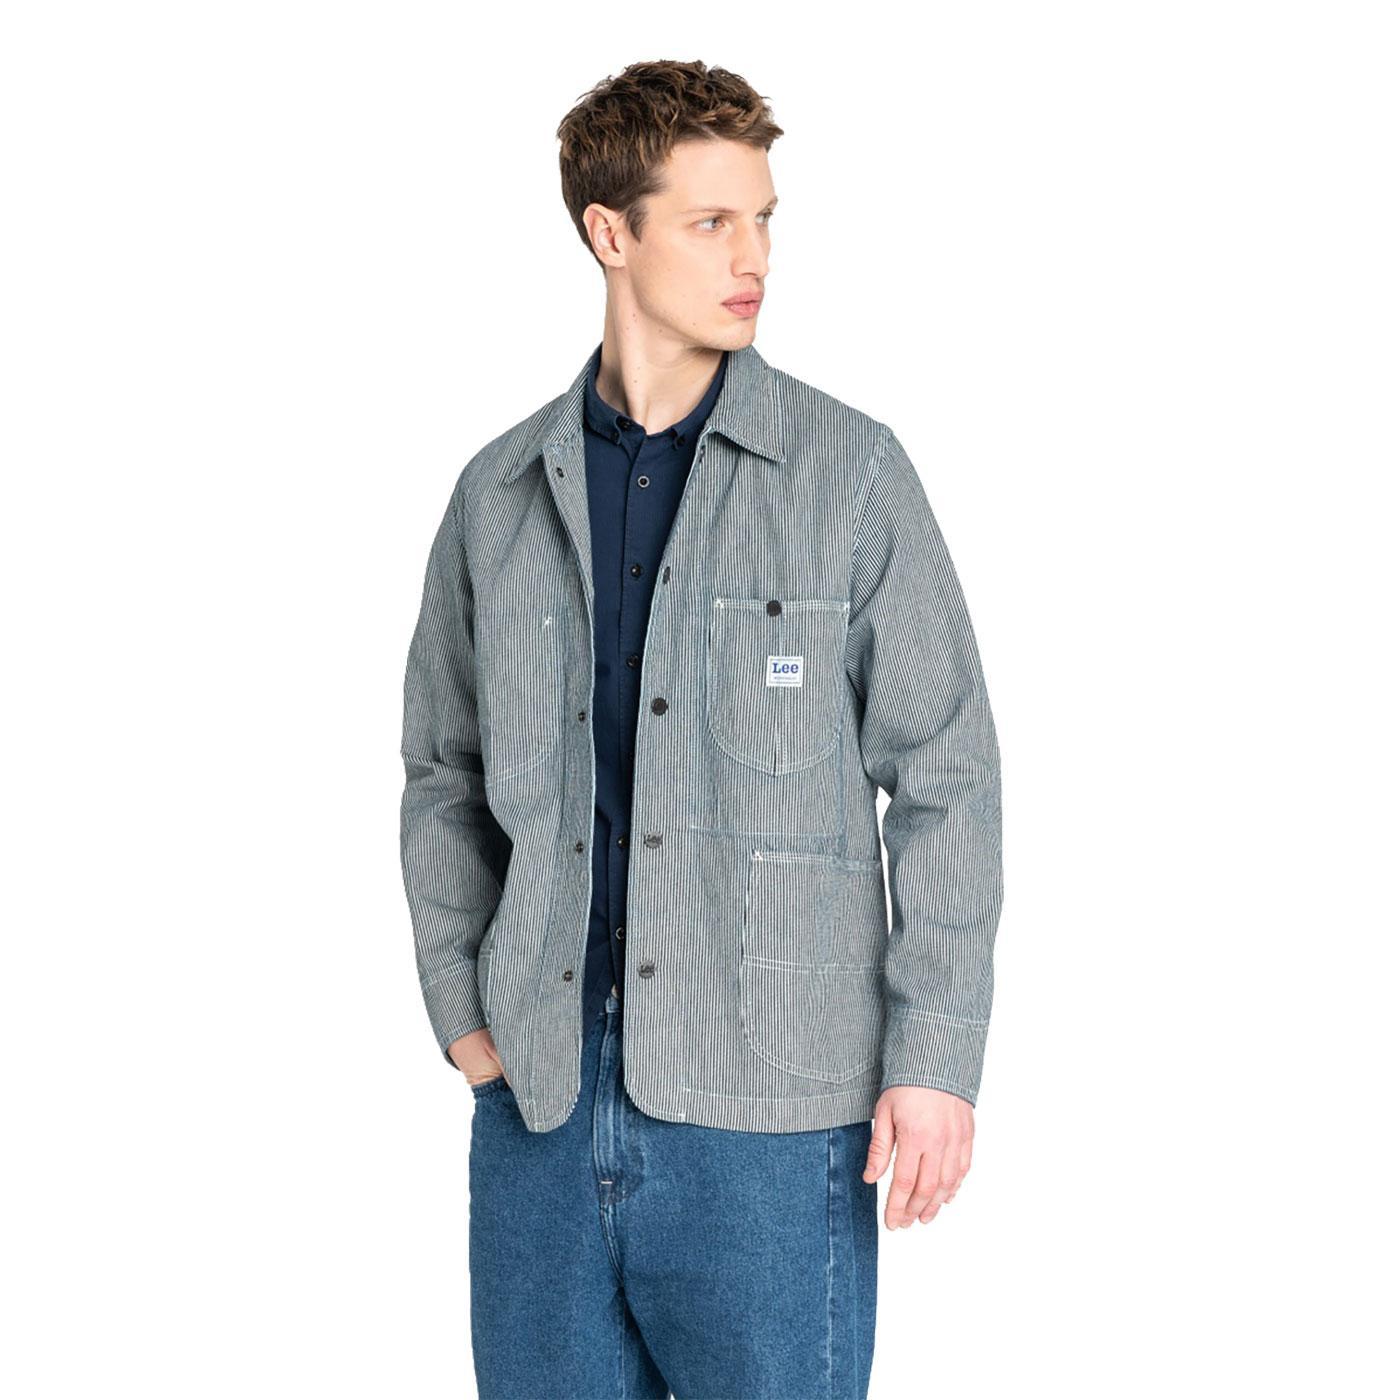 LEE JEANS Men's Retro Loco Pinstripe Denim Jacket